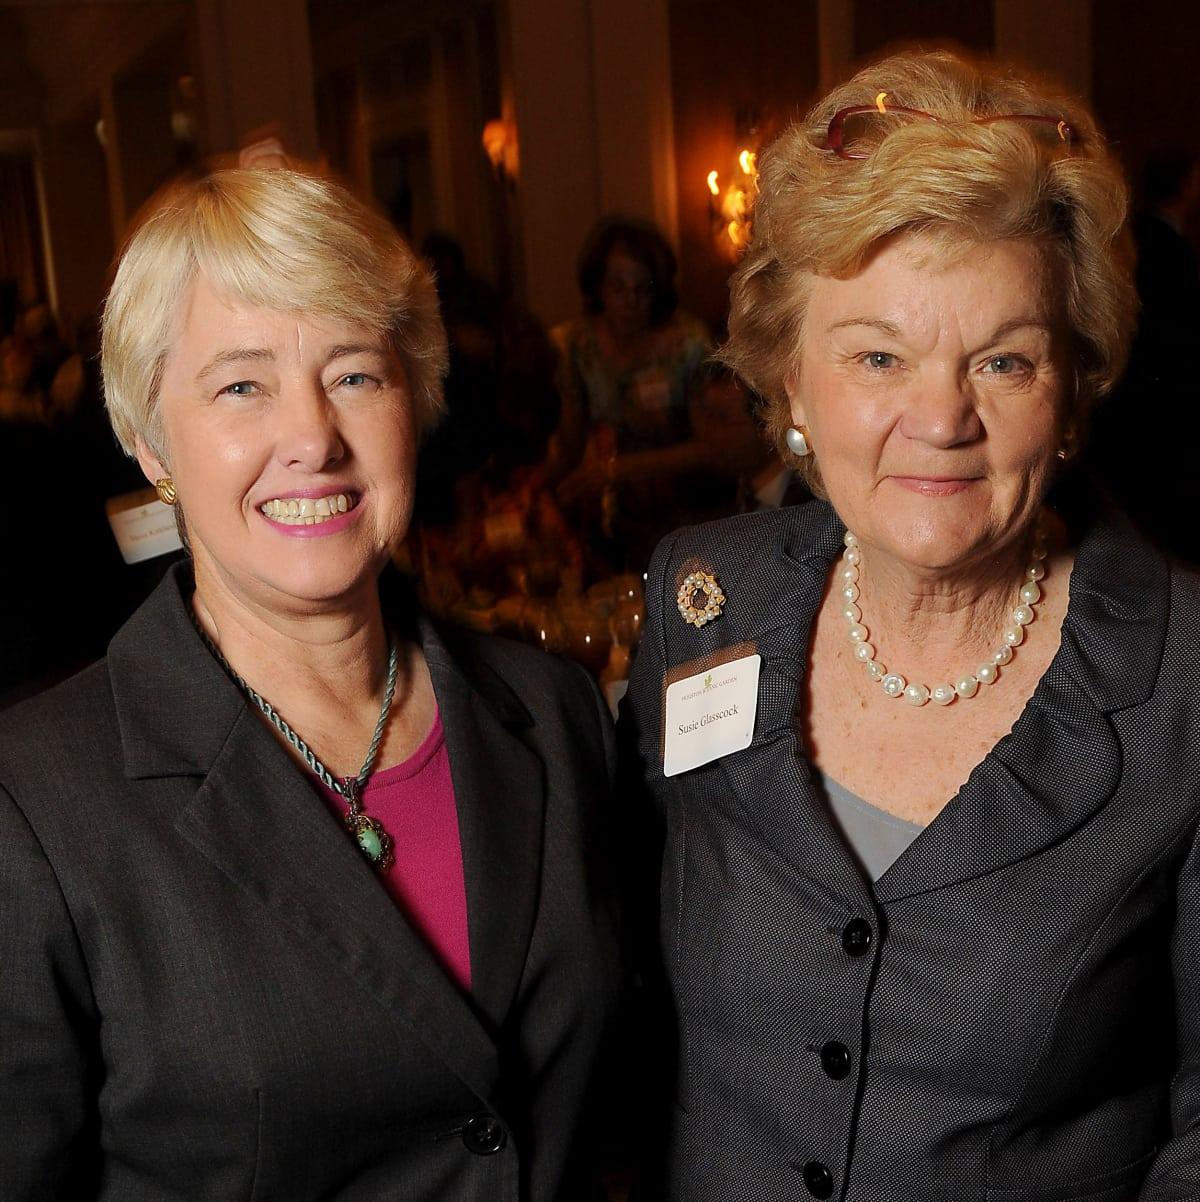 News, Shelby, Houston Botanic Garden Lunch, Sept. 2015, Mayor Annise Parker, Susie Glasscock